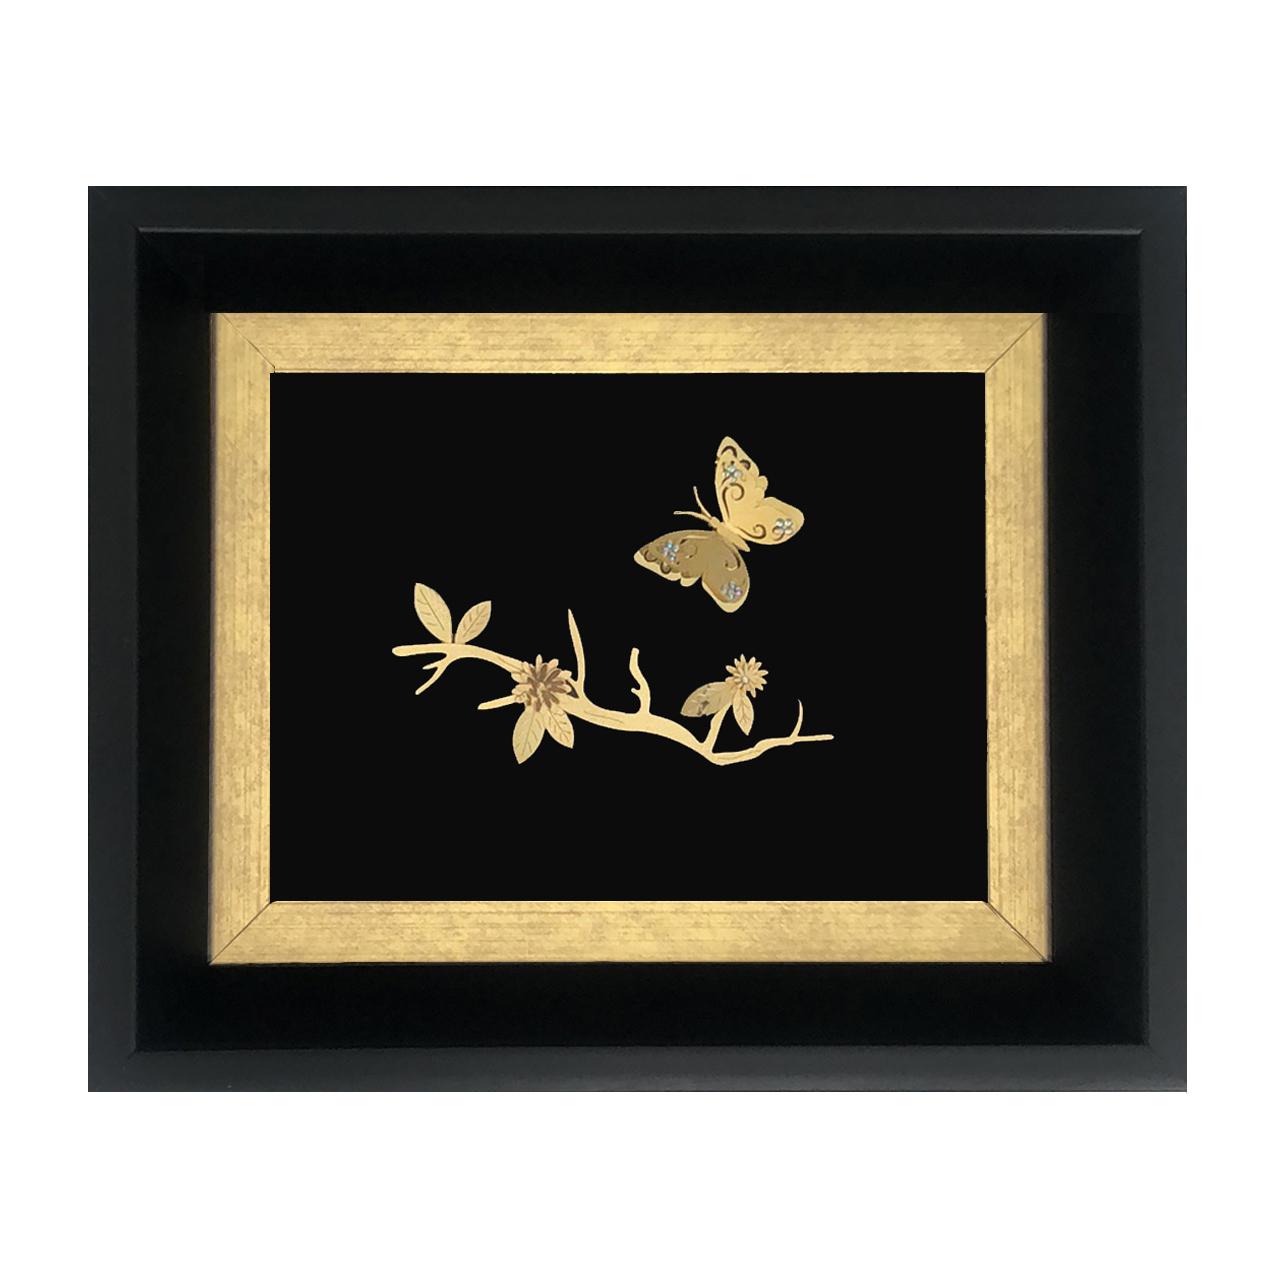 تابلو طلا کوب سام نورزاده طرح پروانه مدل 2156